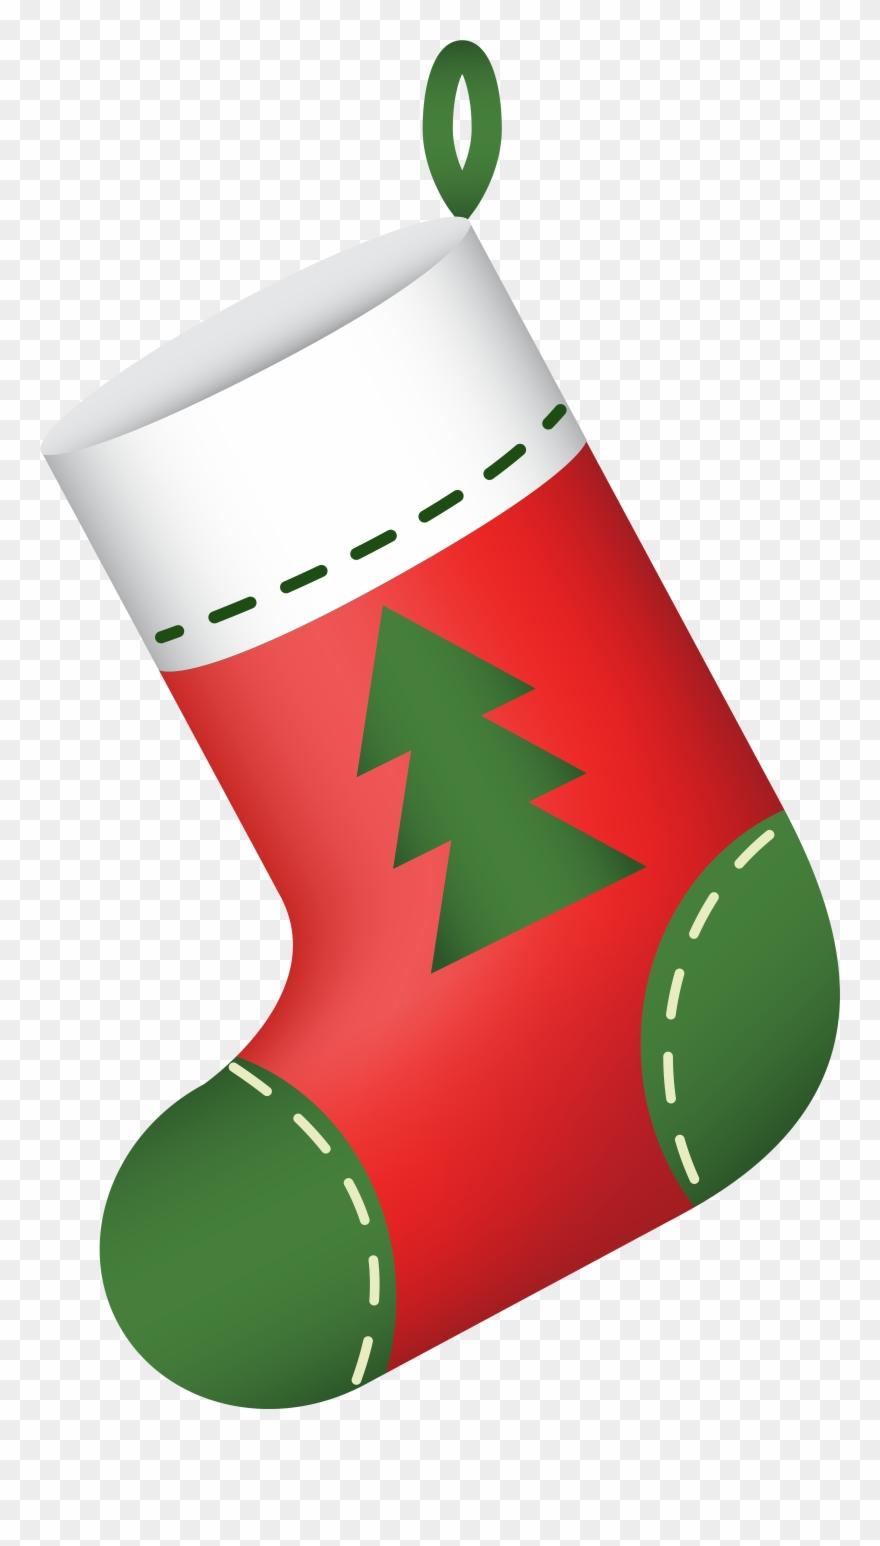 Transparent Christmas Stocking Clipart.